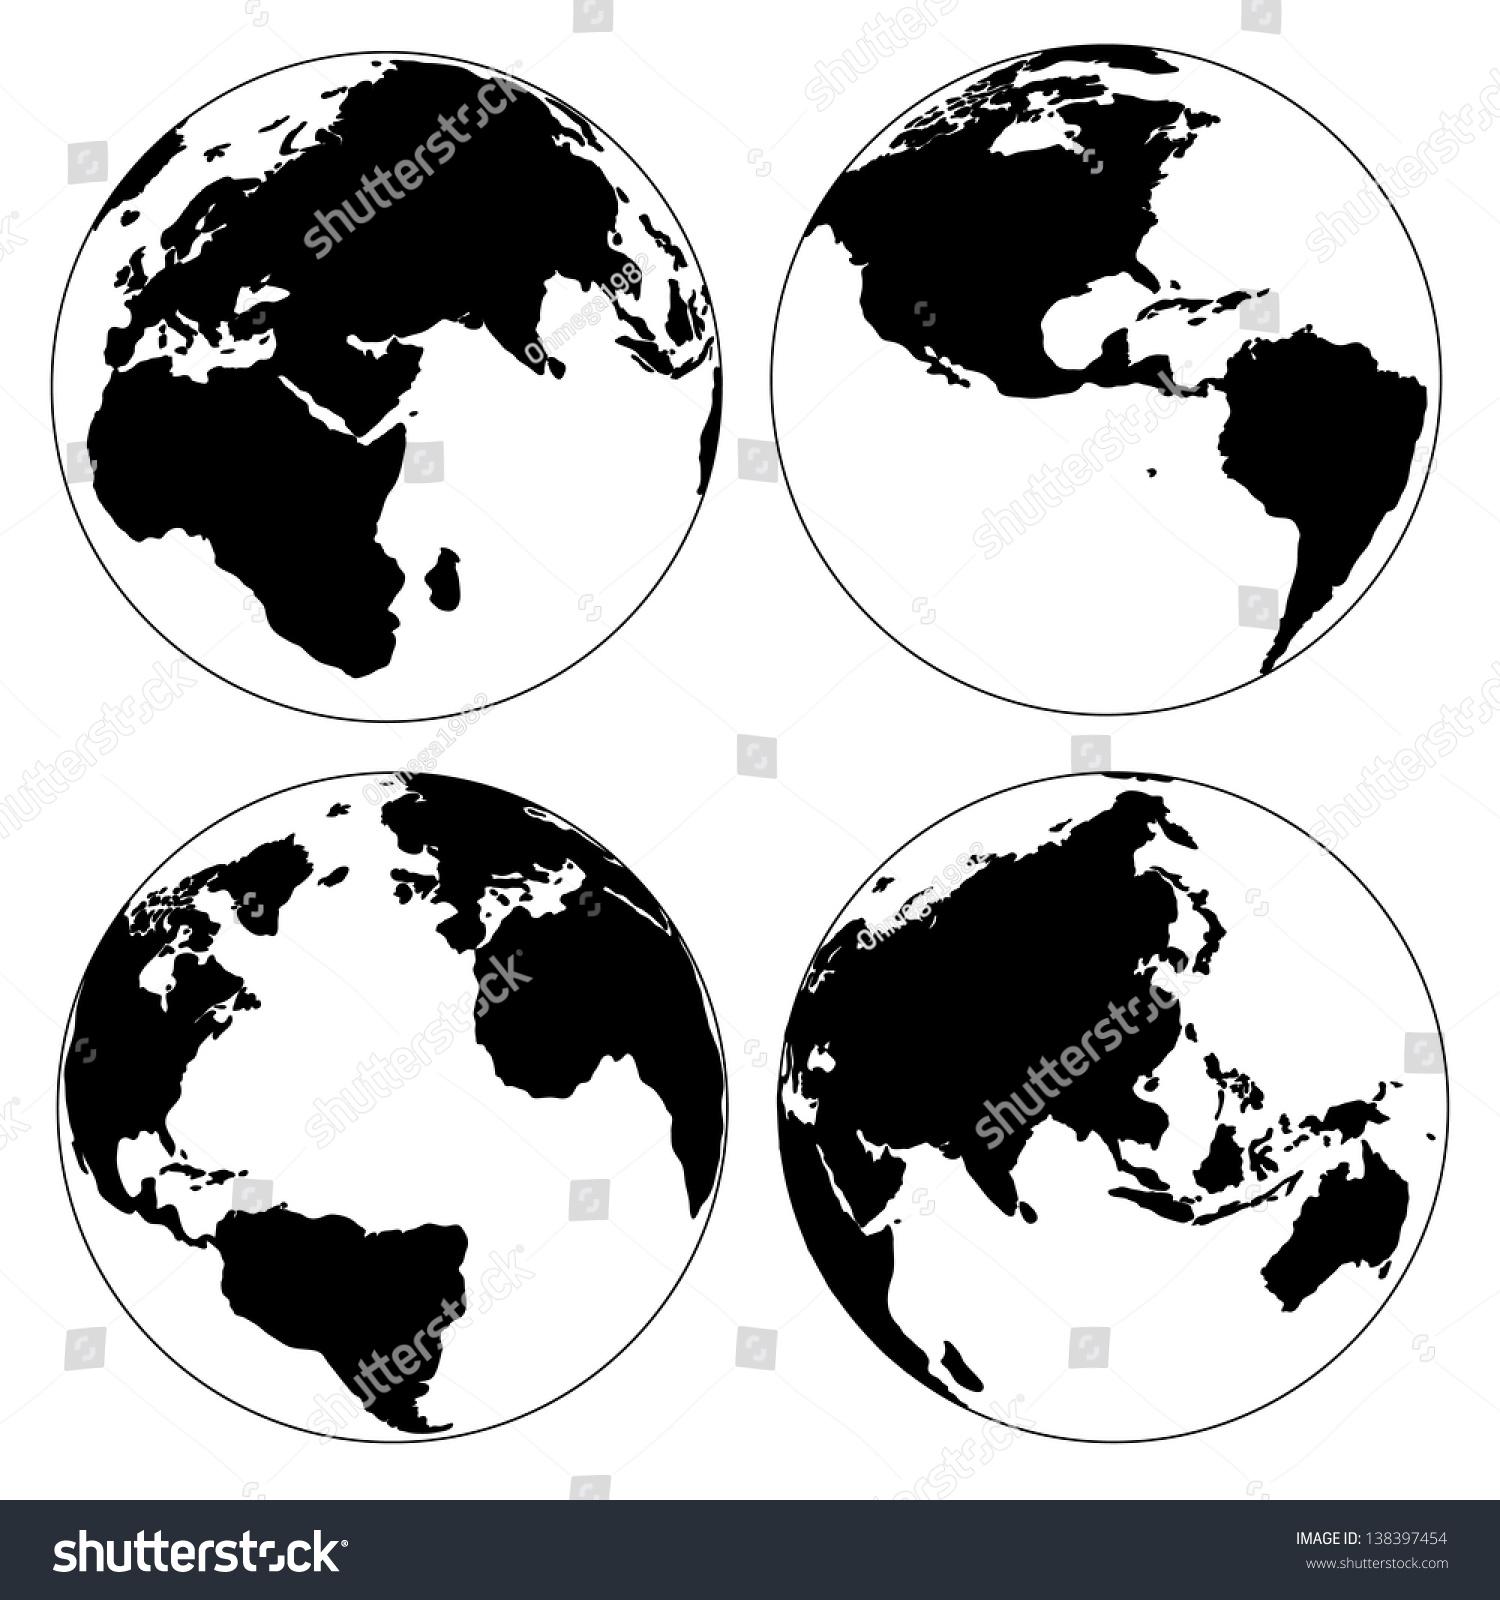 World map globe detail vector illustration vectores en stock world map and globe detail vector illustration eps 10 gumiabroncs Choice Image